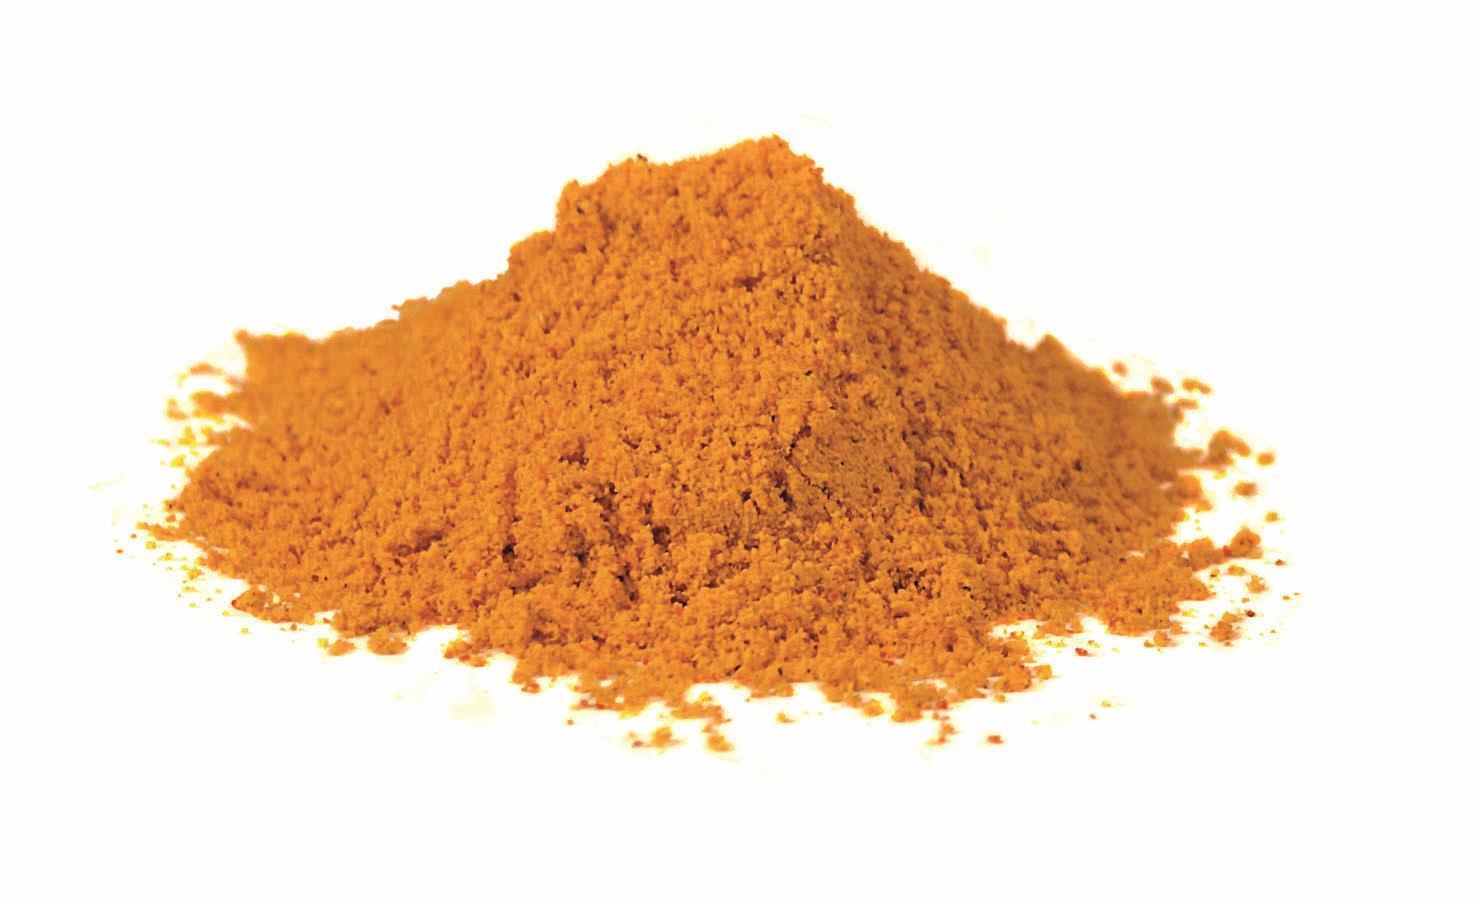 LitoVet 100% GOPO-nyponpulver pulver